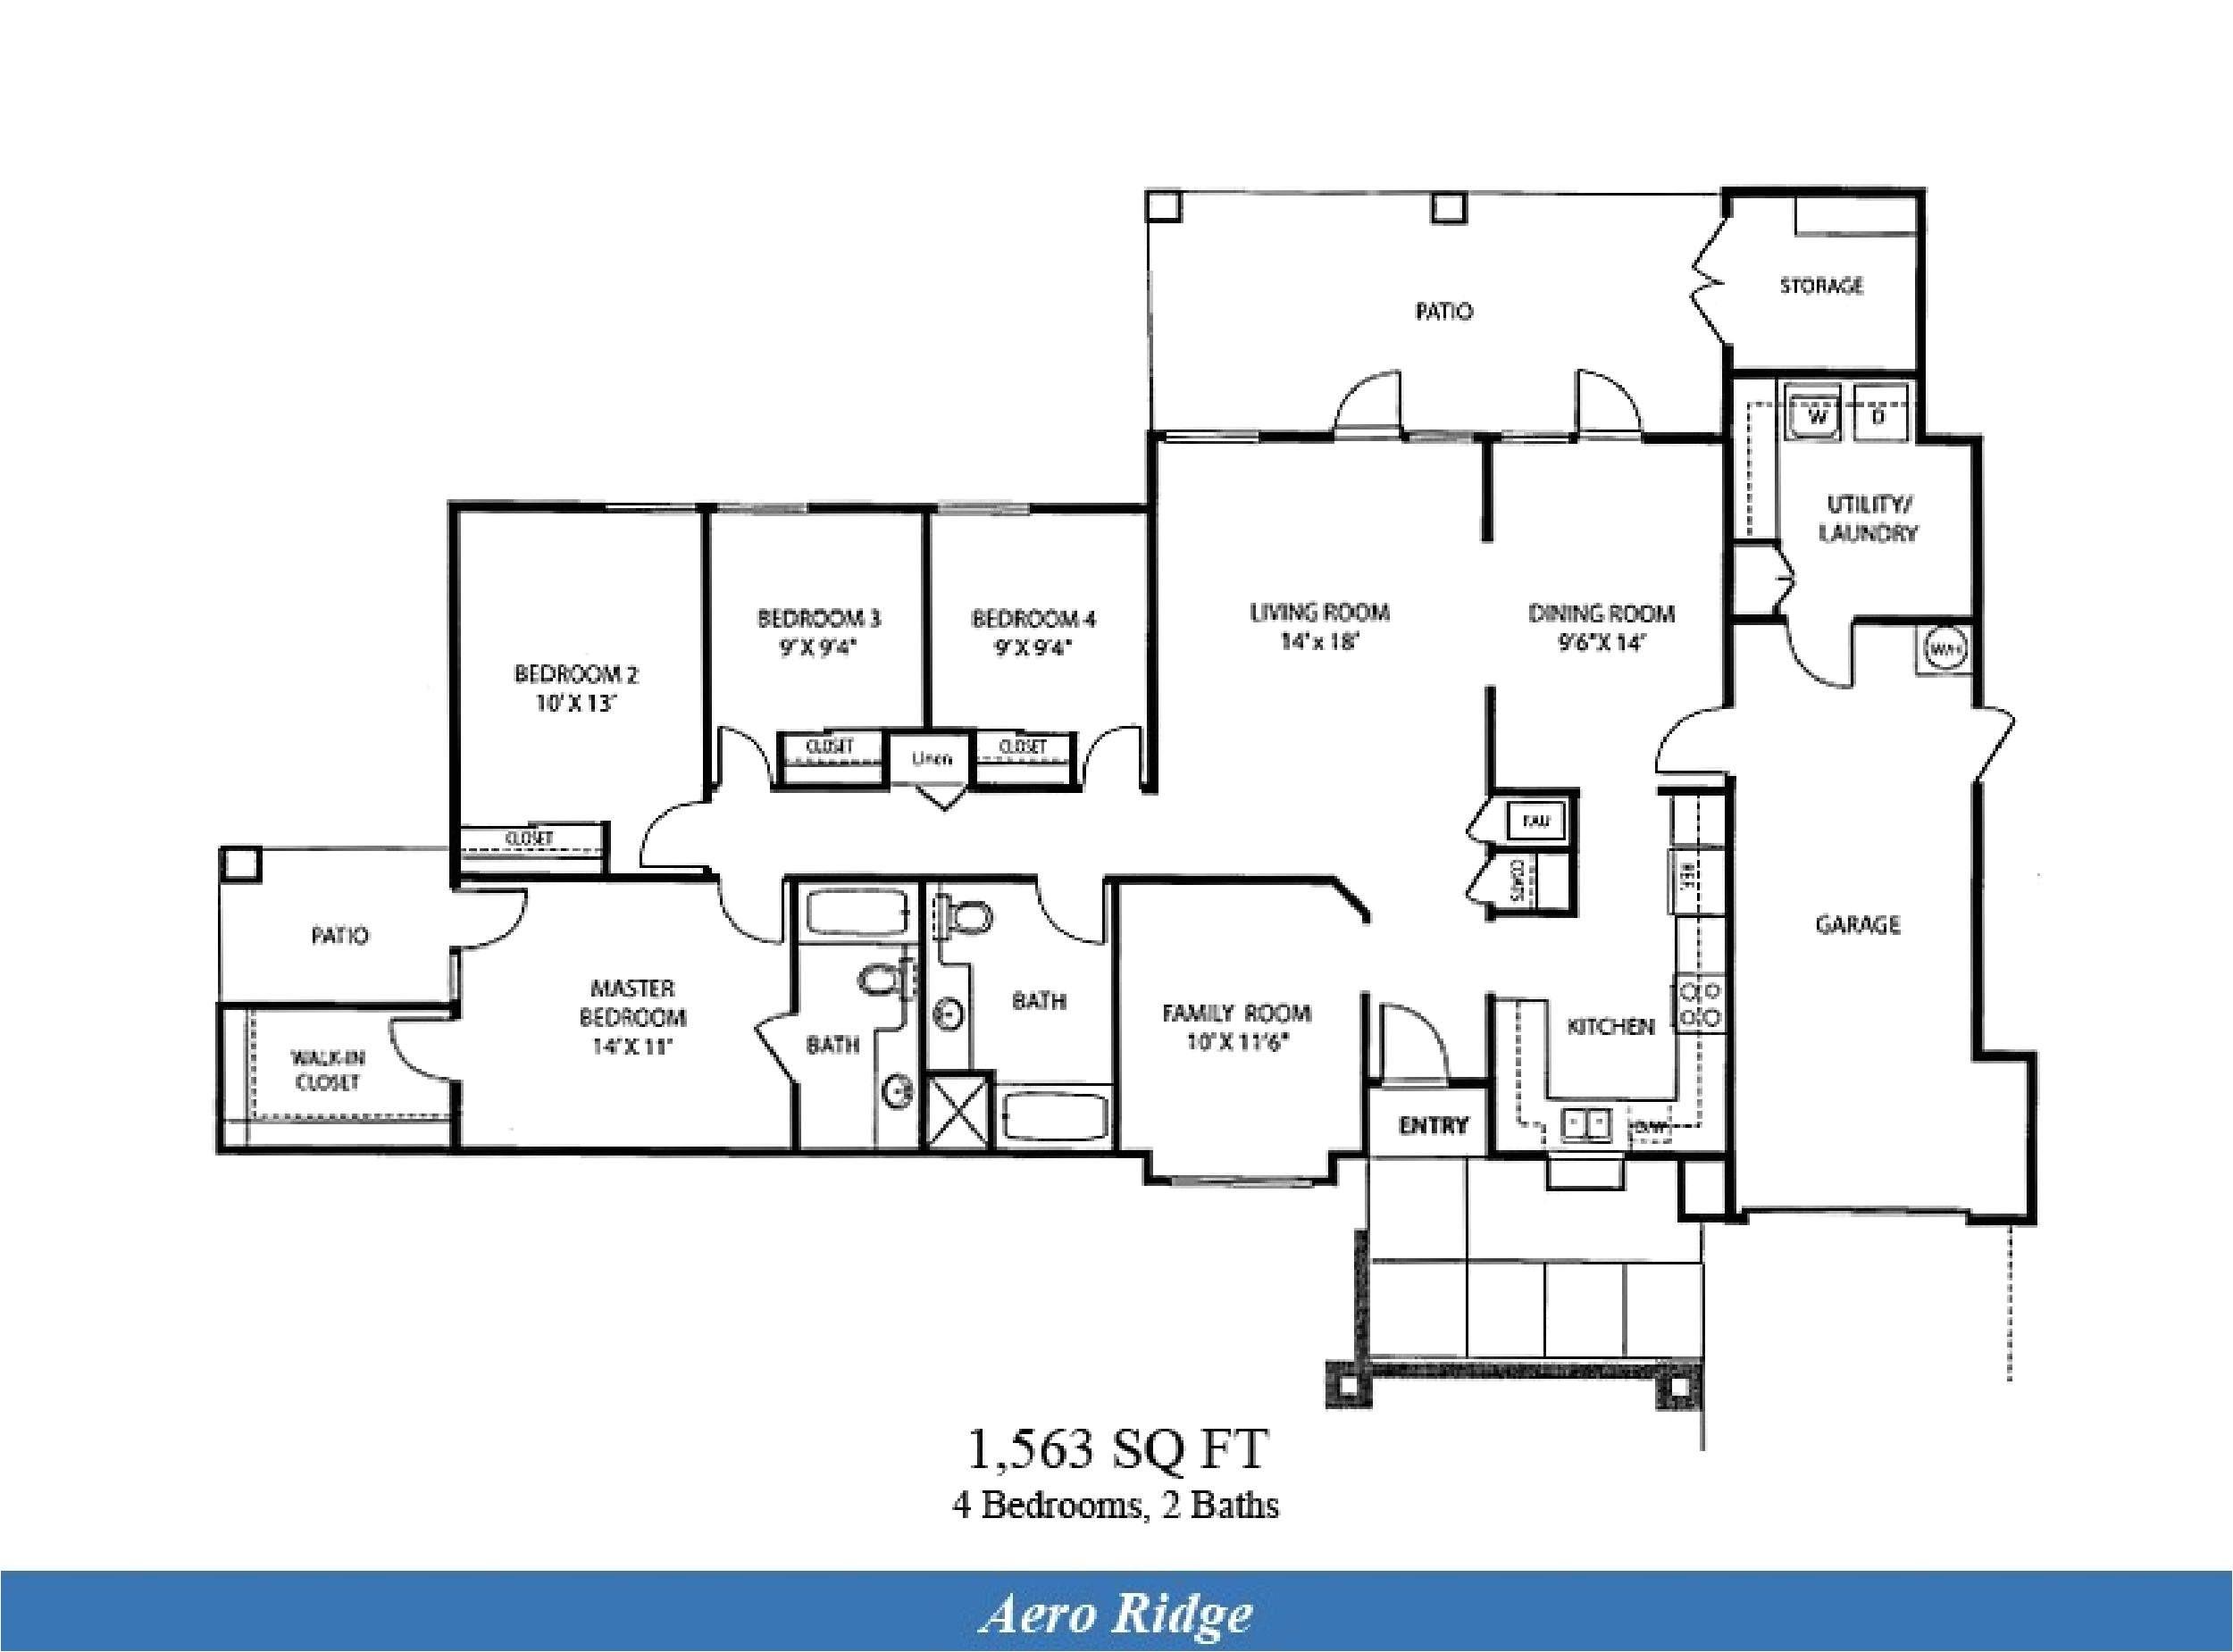 custom home floor plans san antonio luxury rustic mountain home plans european house plans mountain home plans